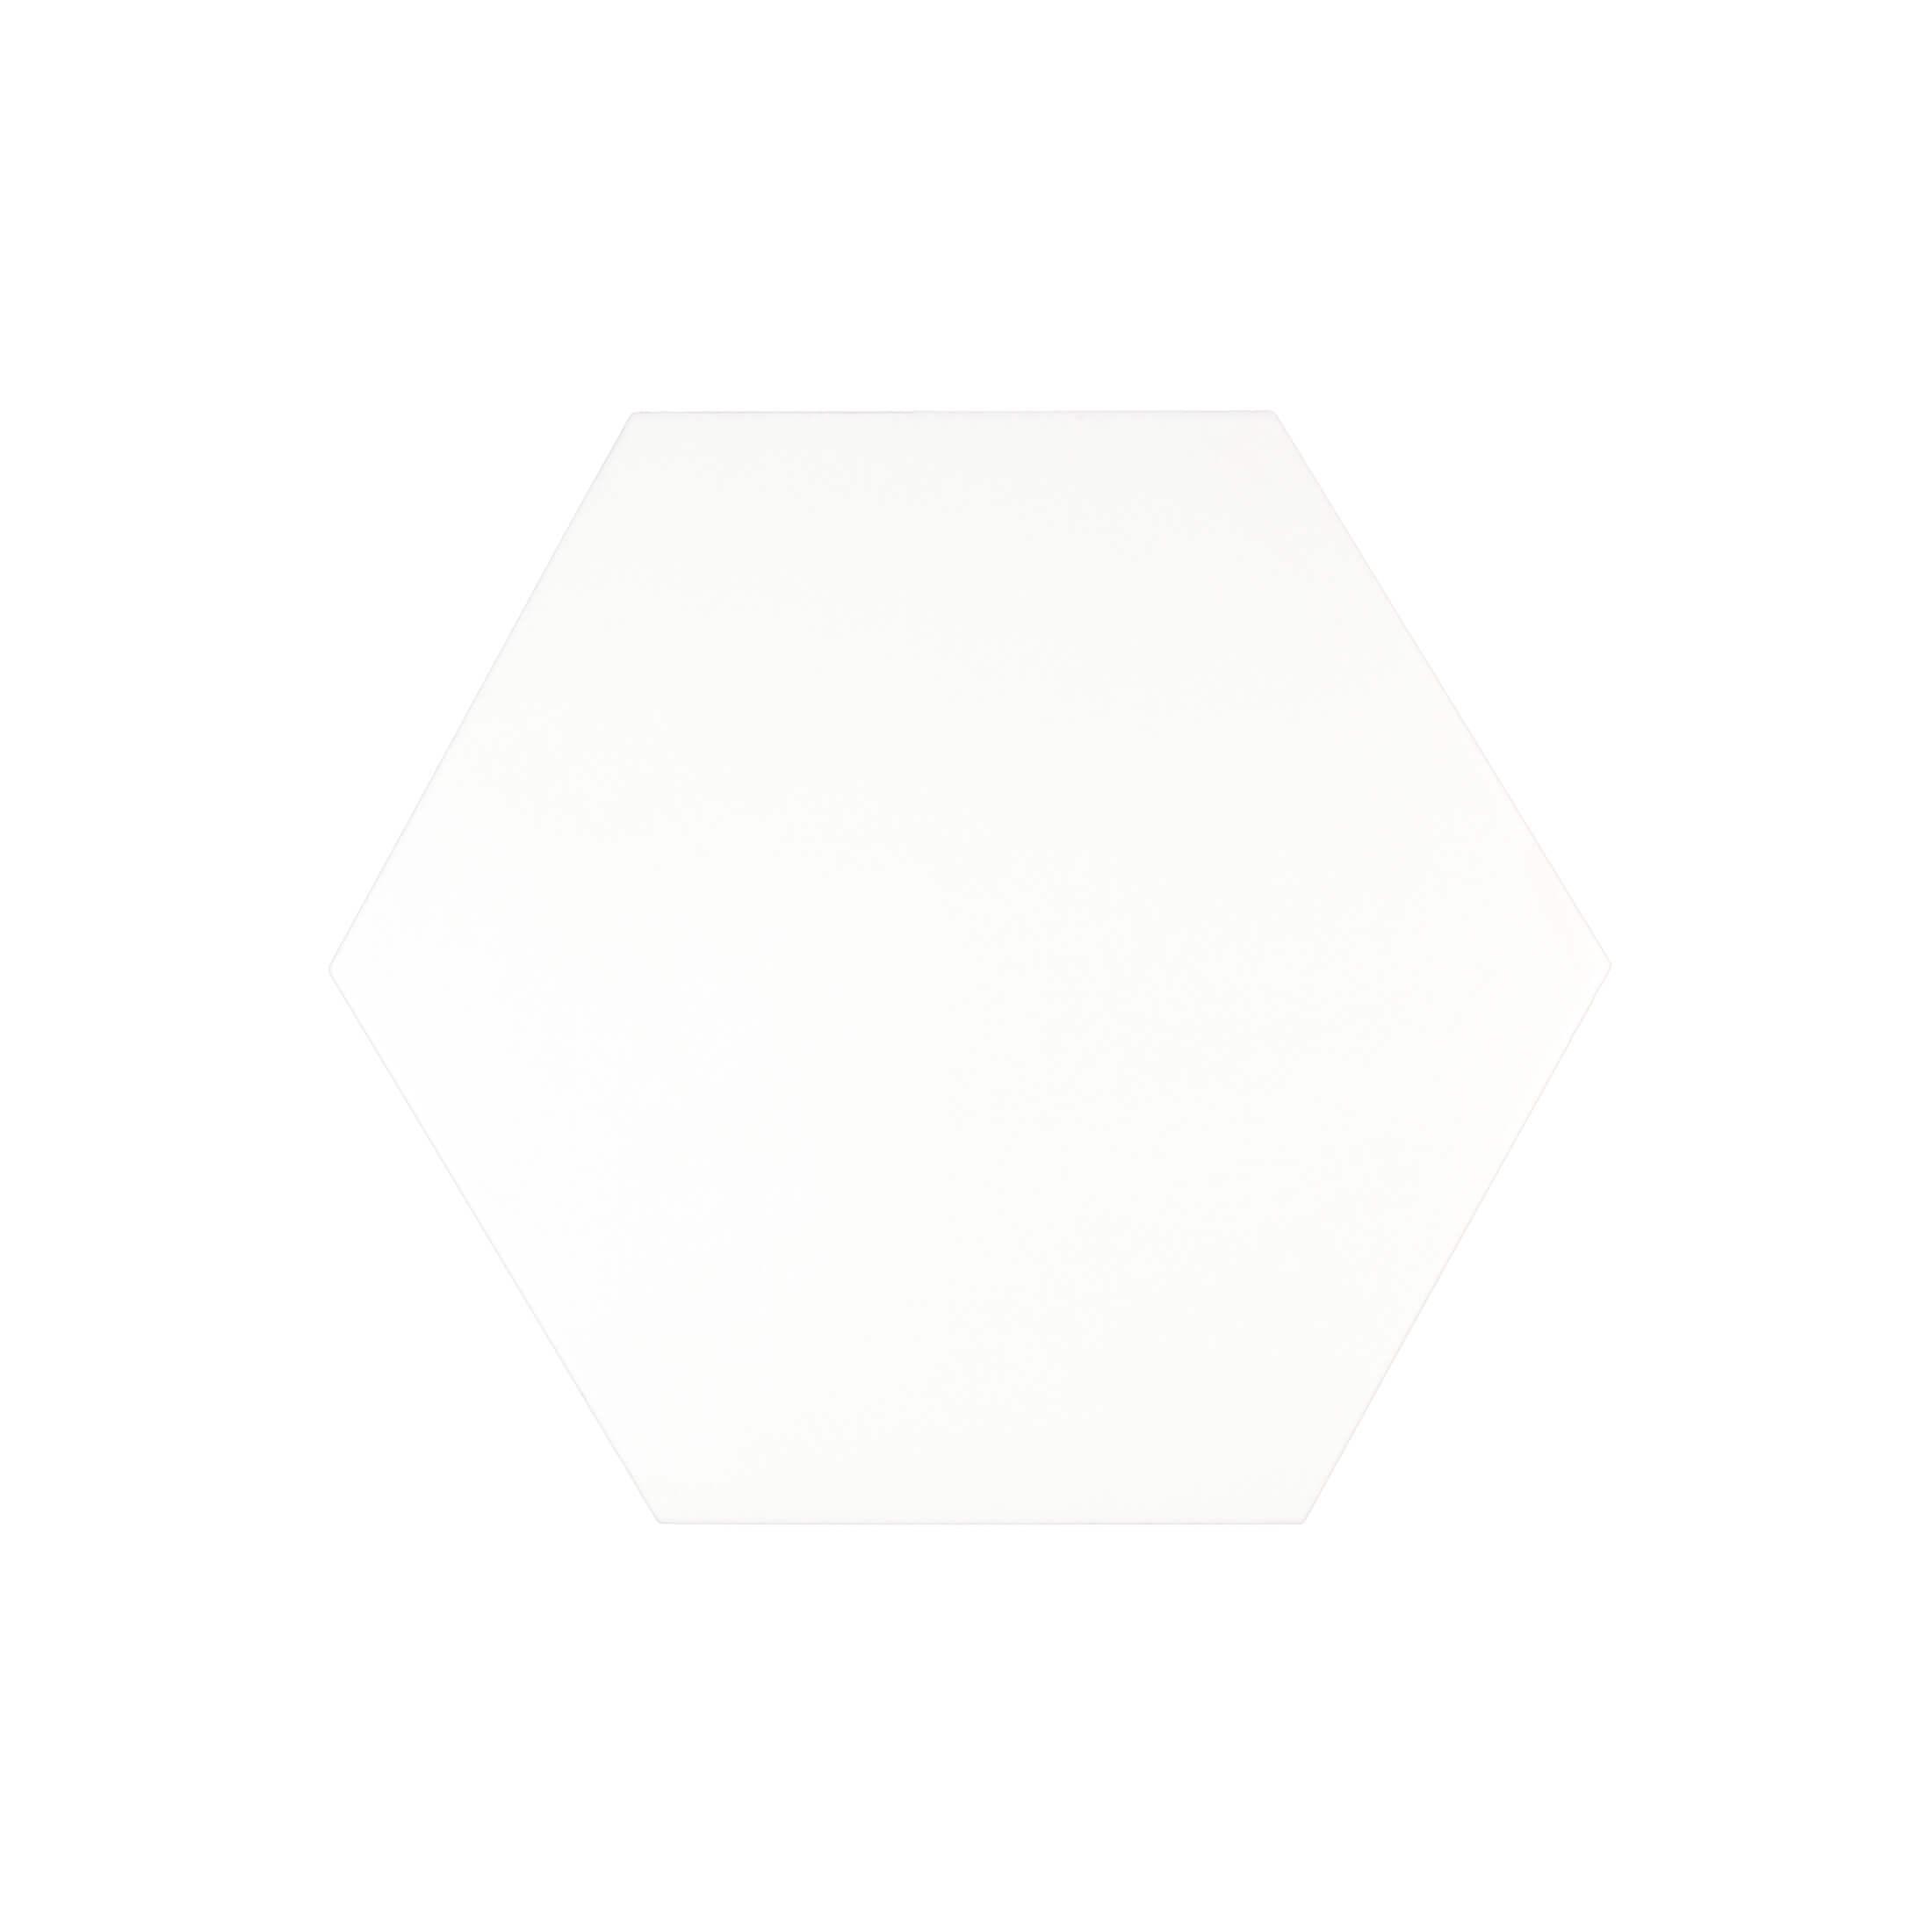 ADPV9011 - PAVIMENTO WHITE - 20 cm X 2,3 cm